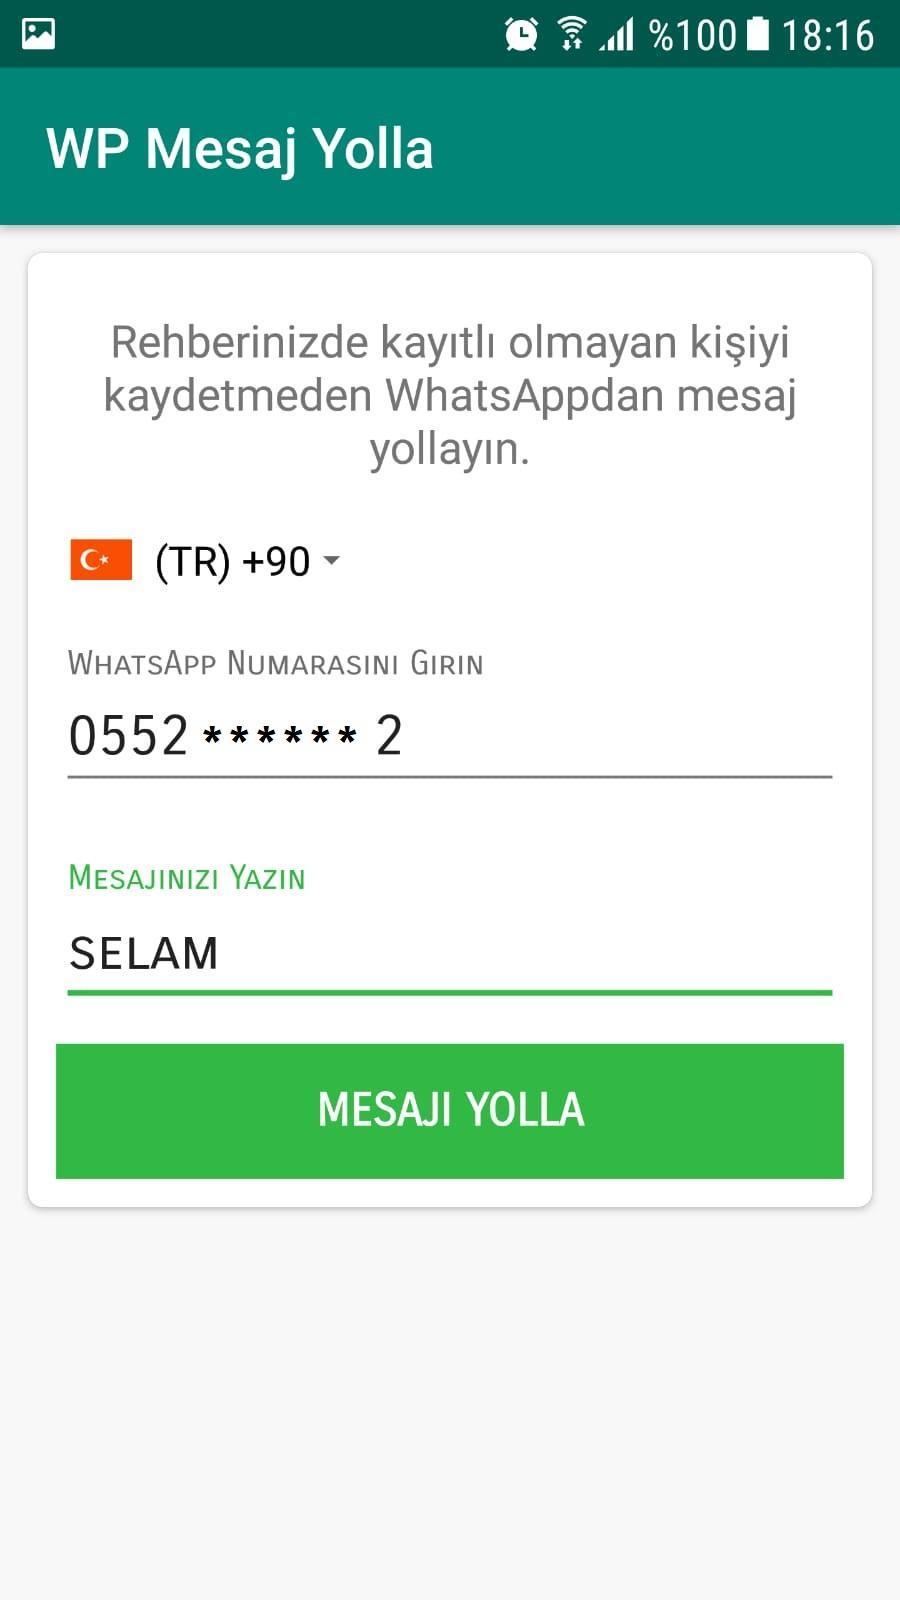 WP Mesaj Yolla for Android - APK Download